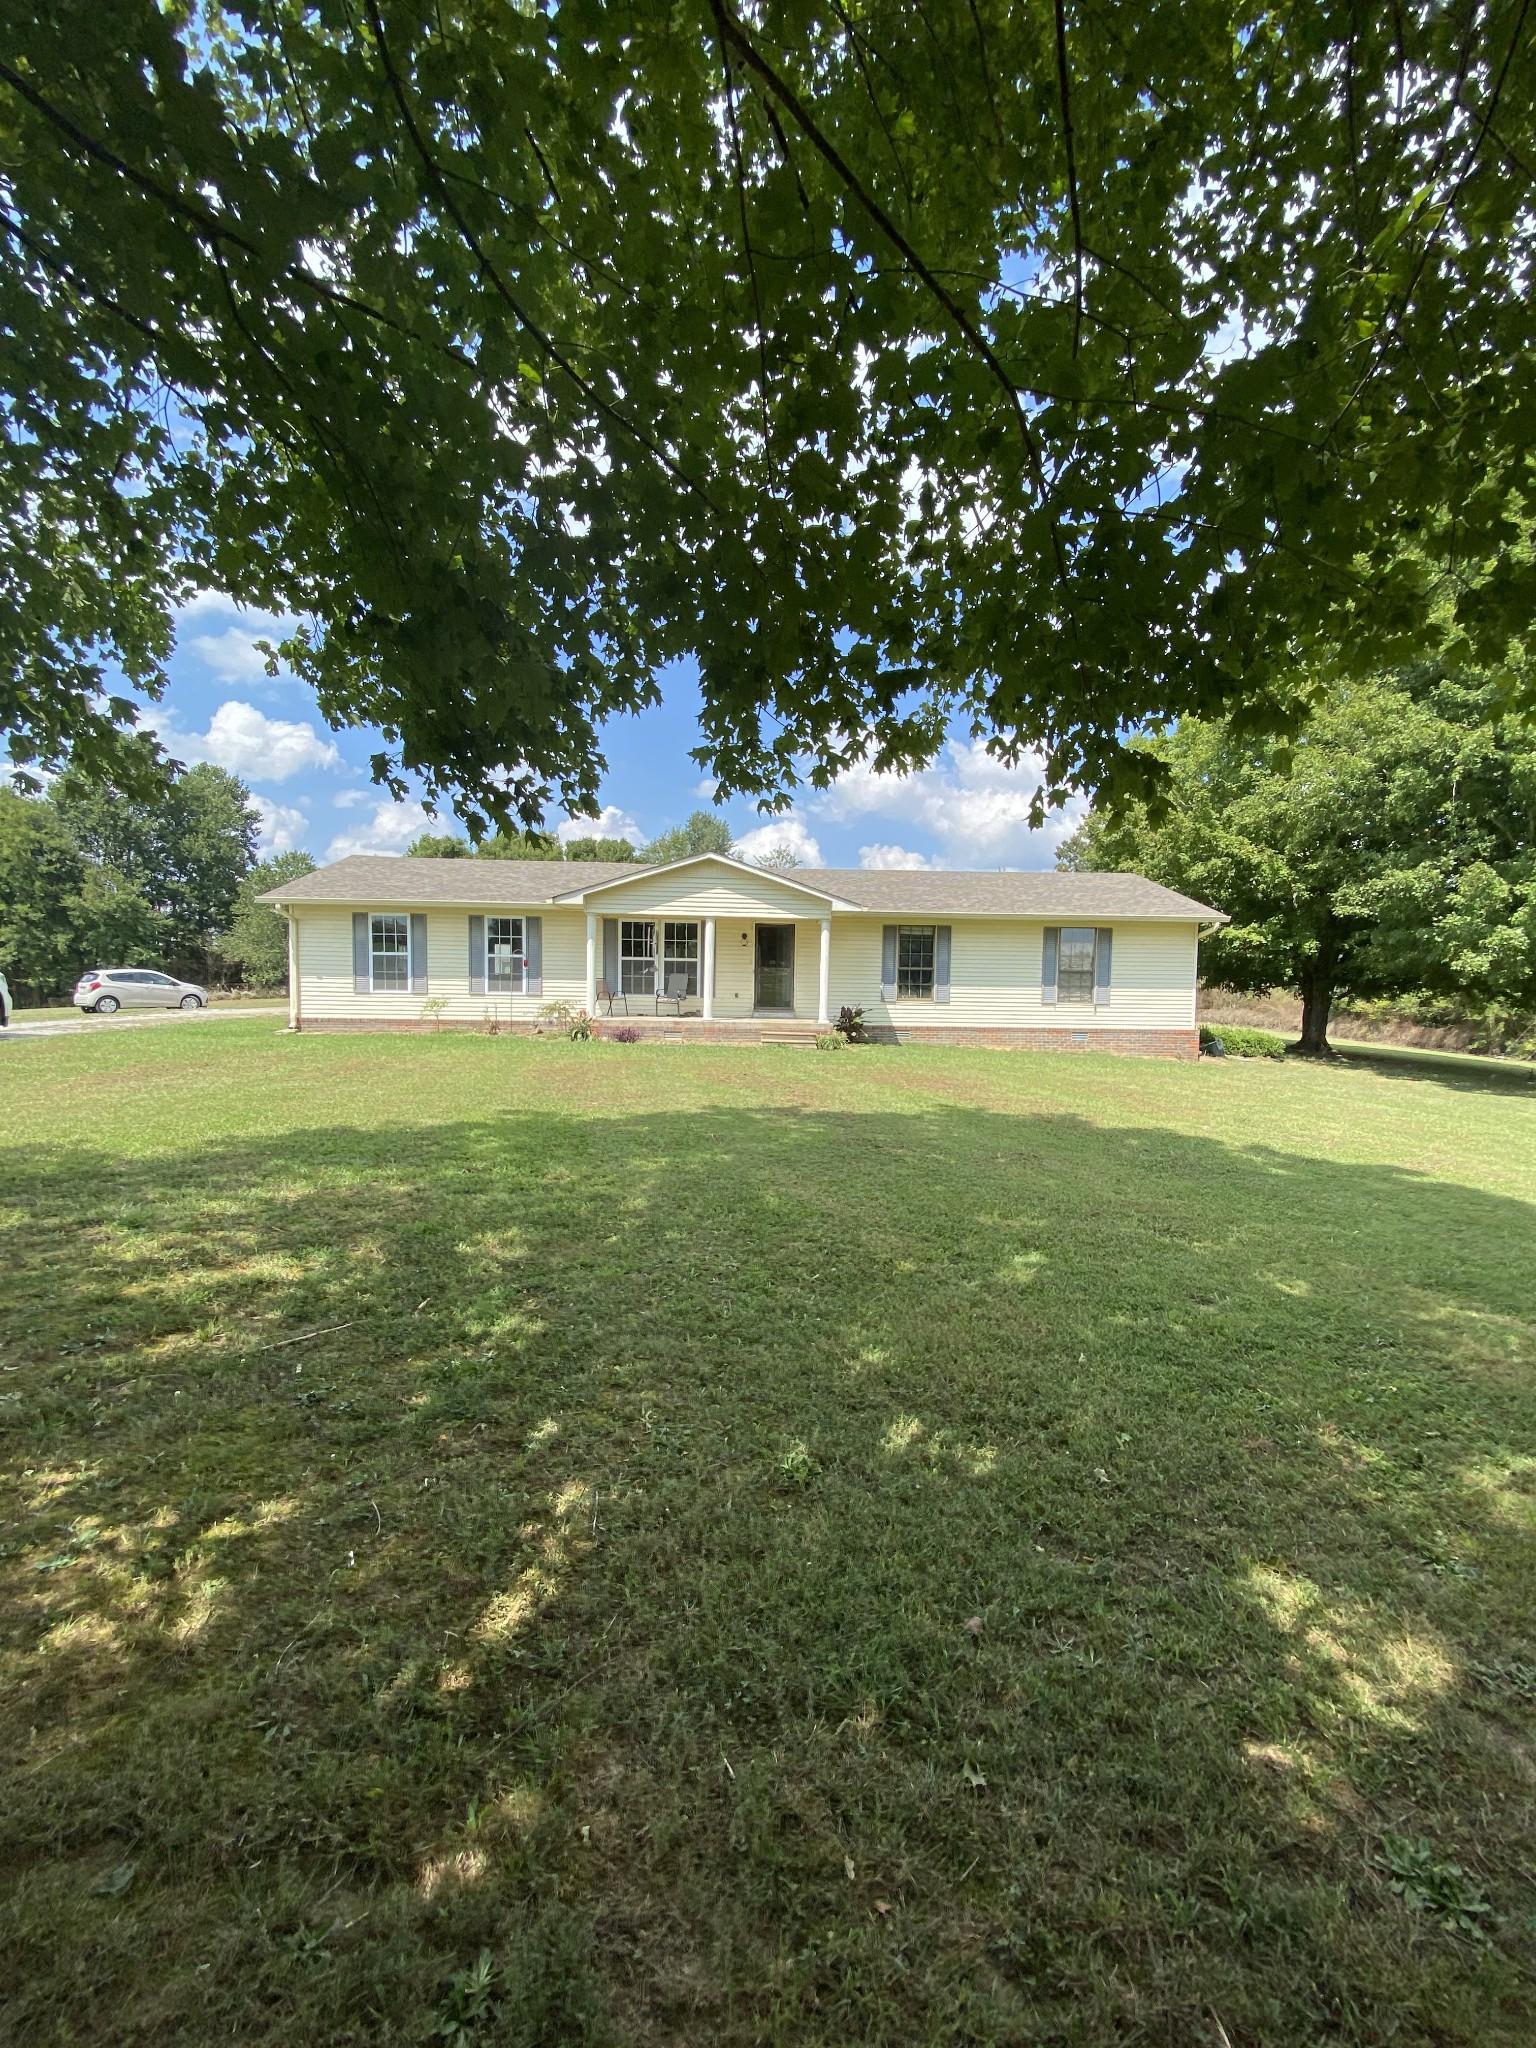 221 Riddle Ln Property Photo - Loretto, TN real estate listing